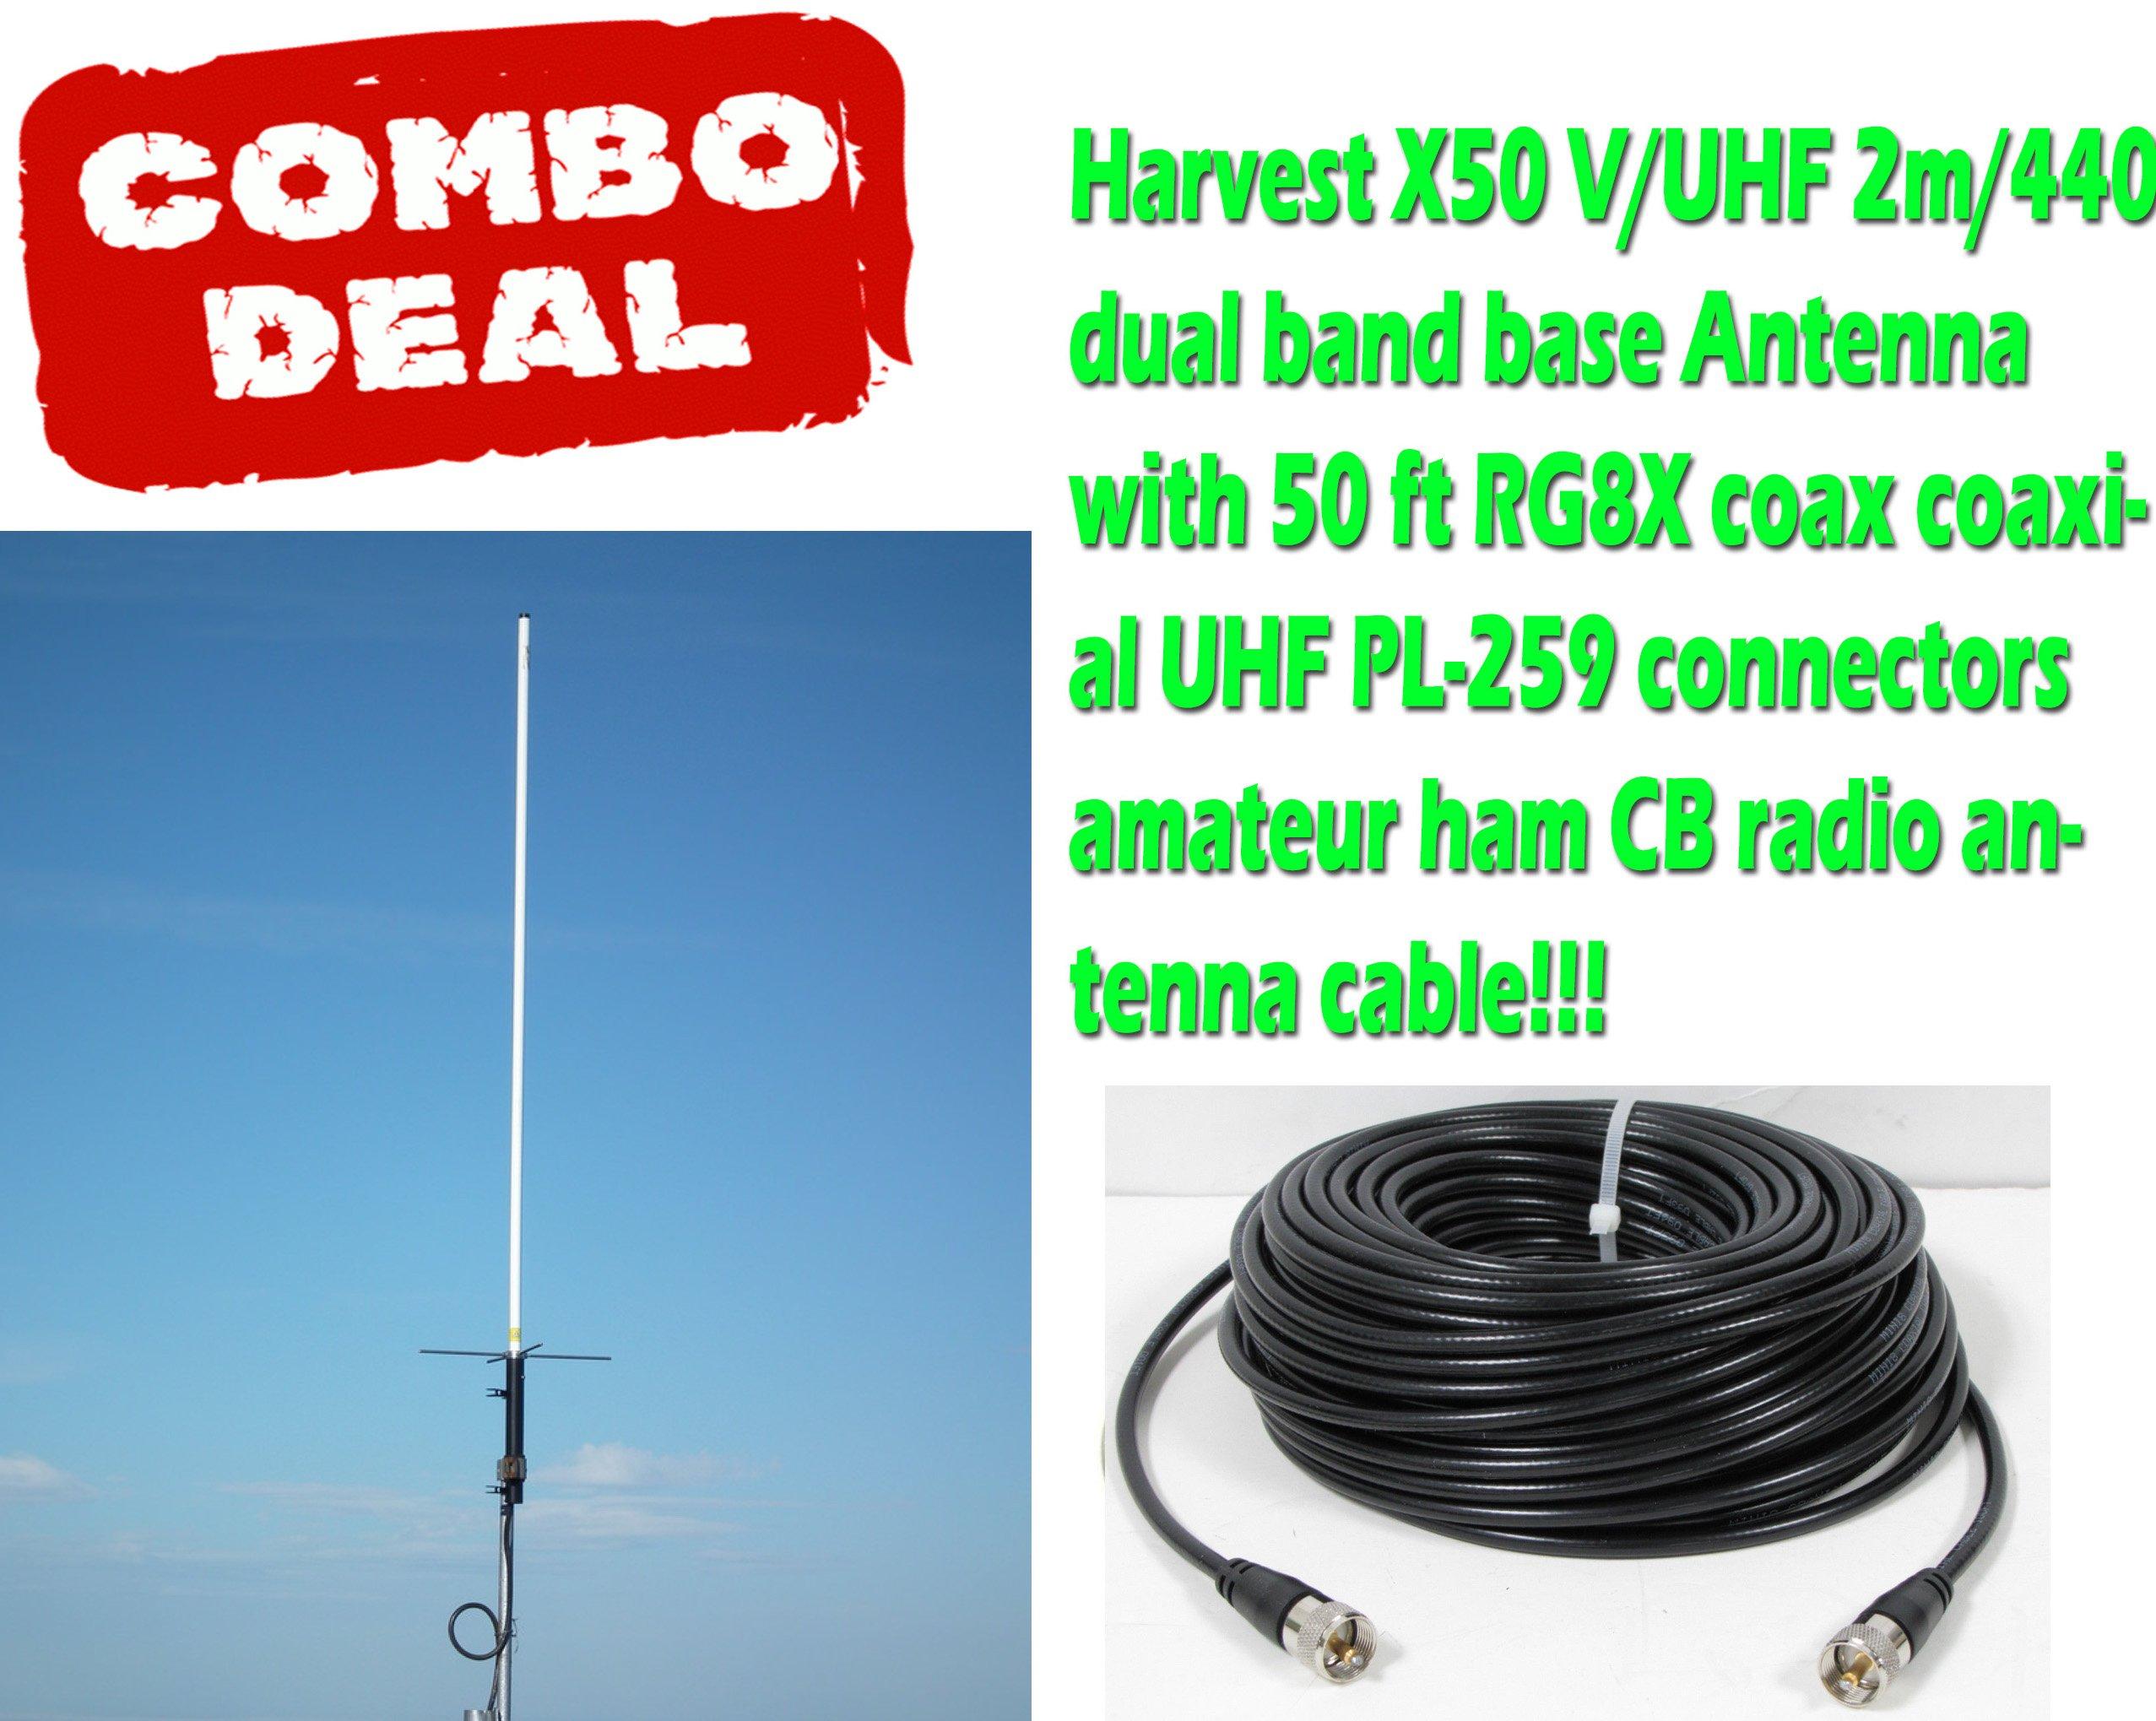 Harvest X50 V/UHF 2m/440 dua Antenna with 50 Ft Coax - 4.5dB(VHF)/7.2dB(UHF)